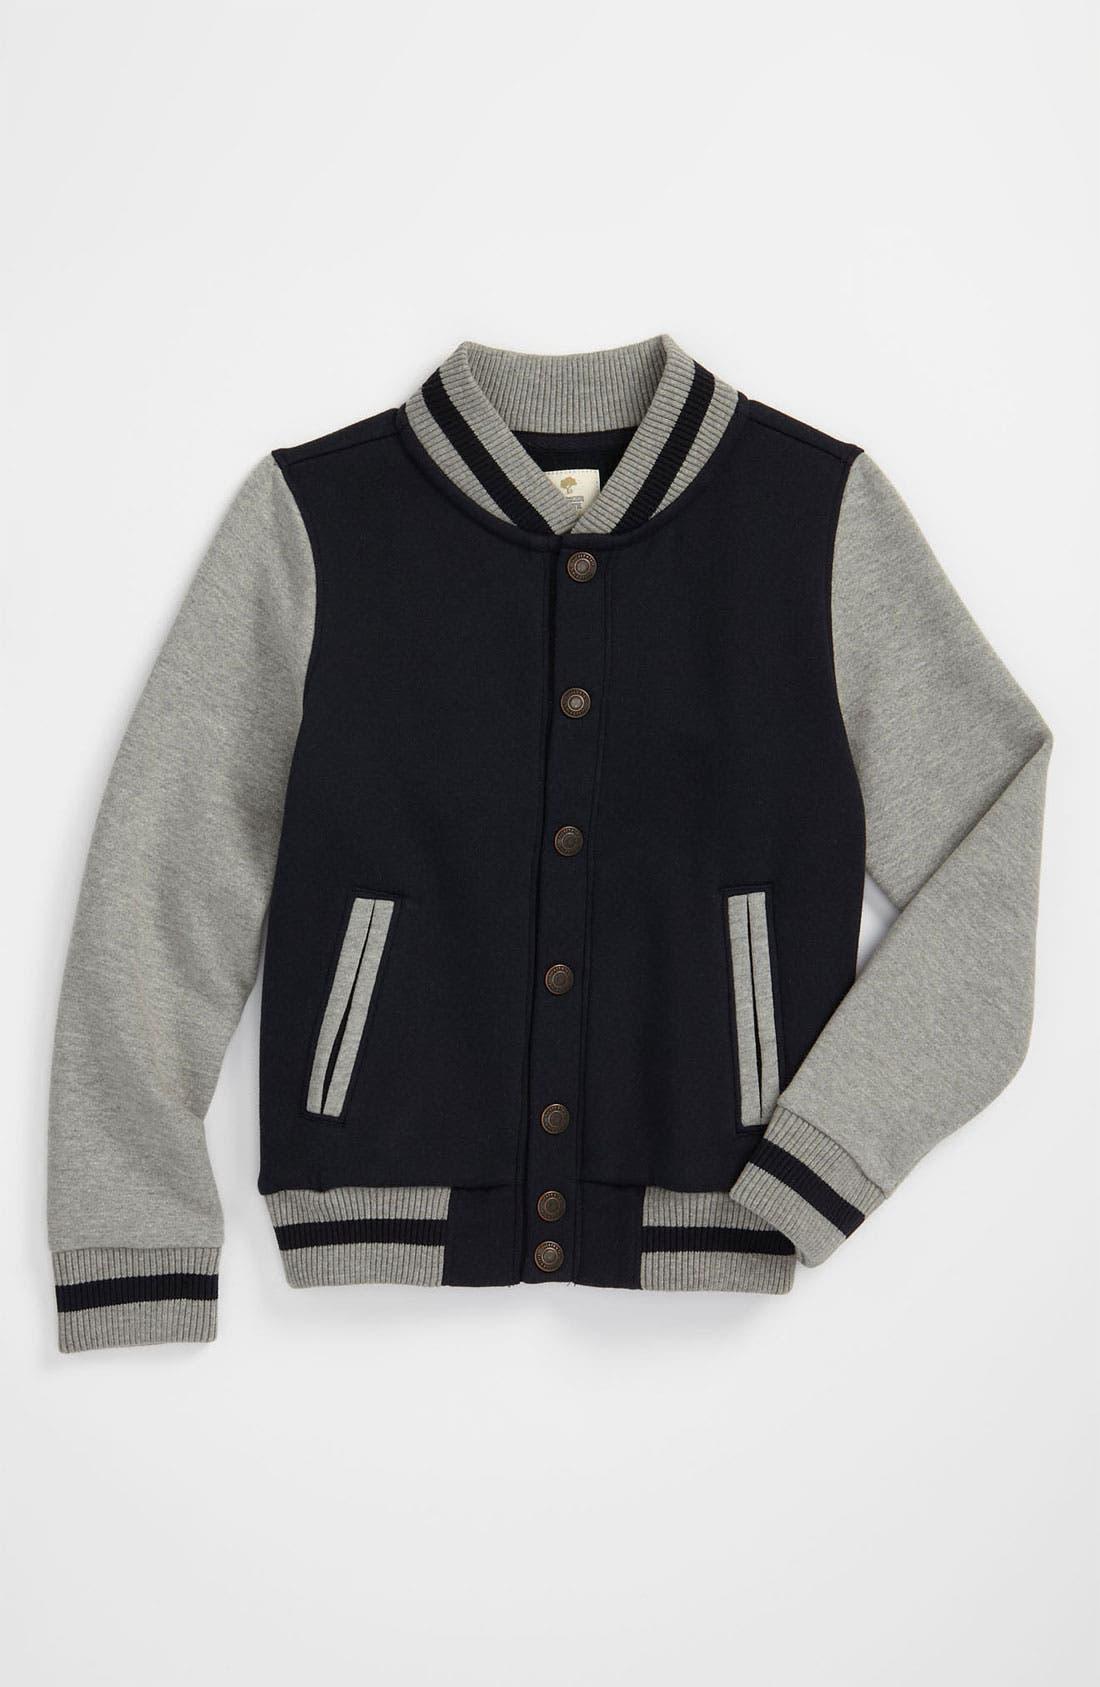 Main Image - Tucker + Tate 'Emmit' Varsity Jacket (Little Boys)